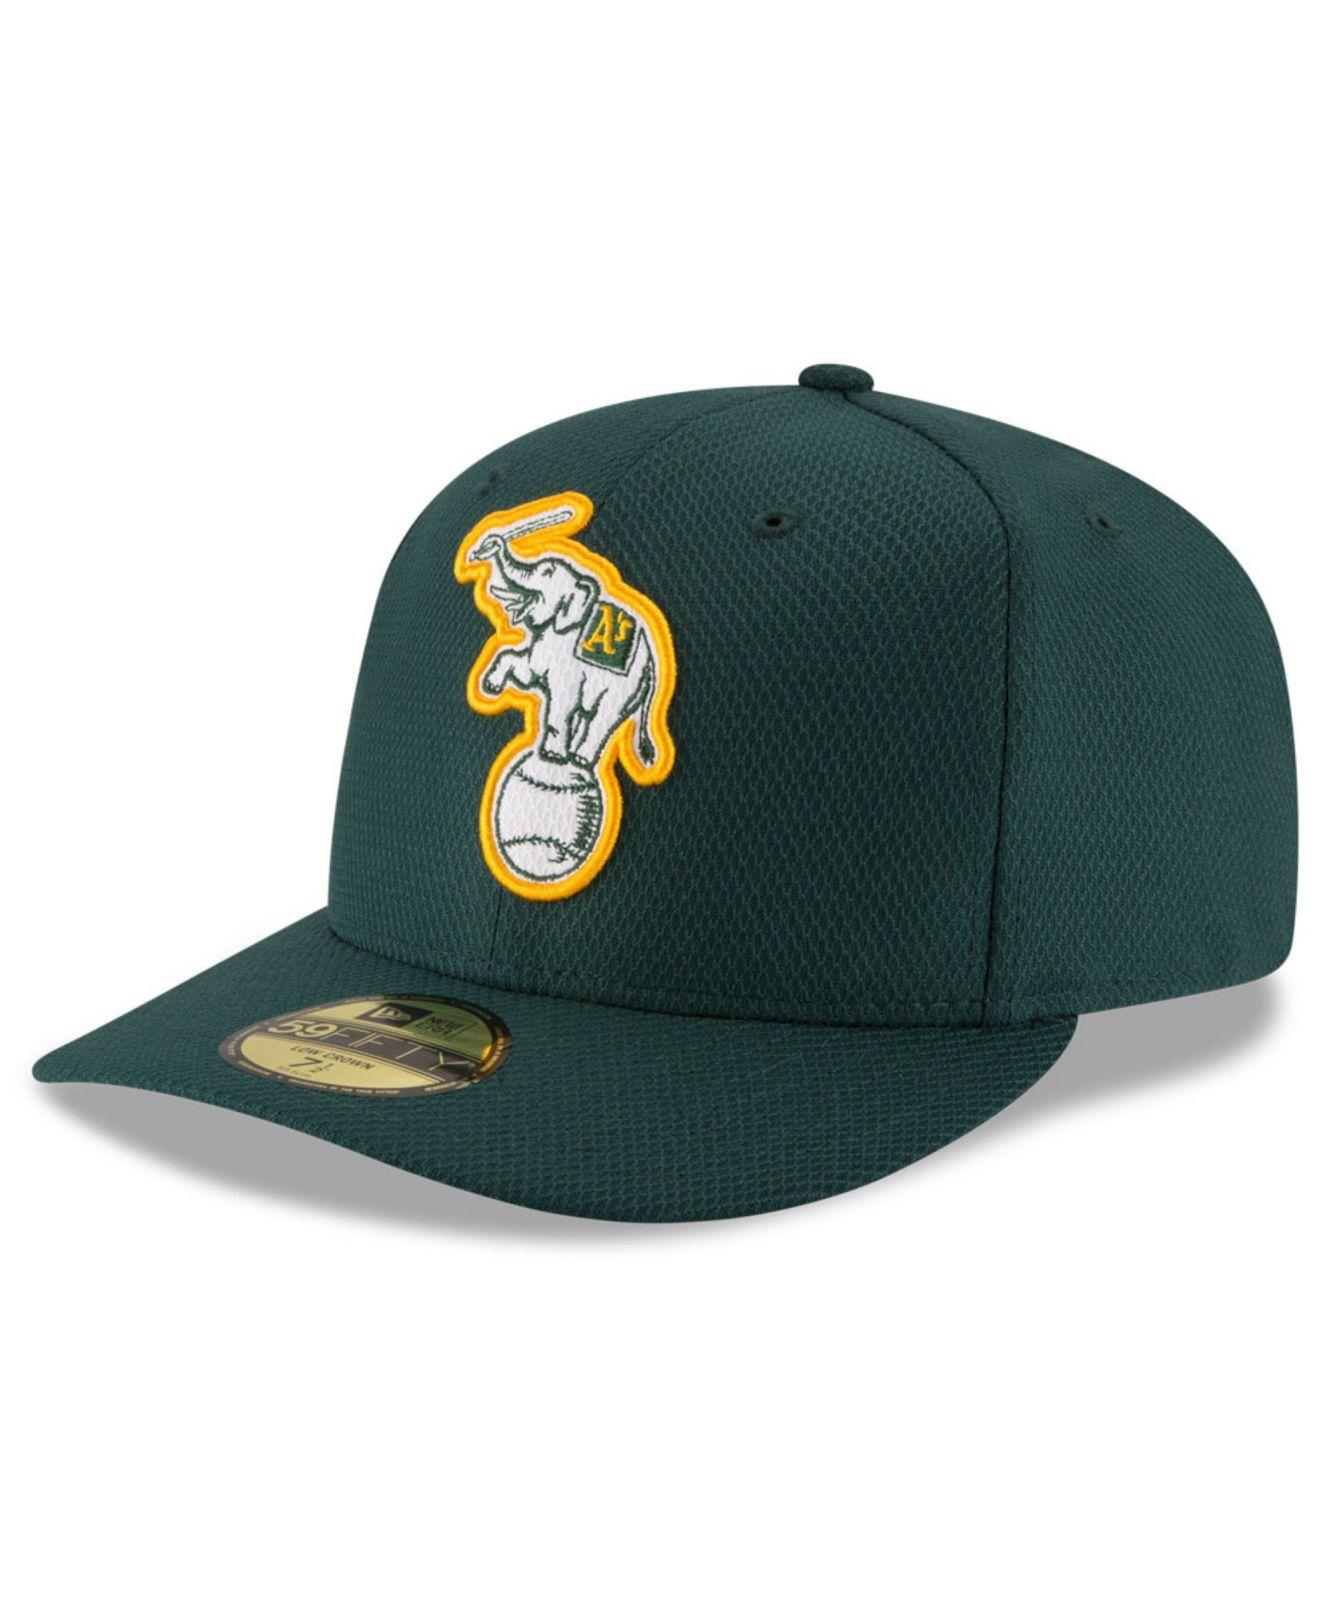 Oakland Athletics New Era 59fifty